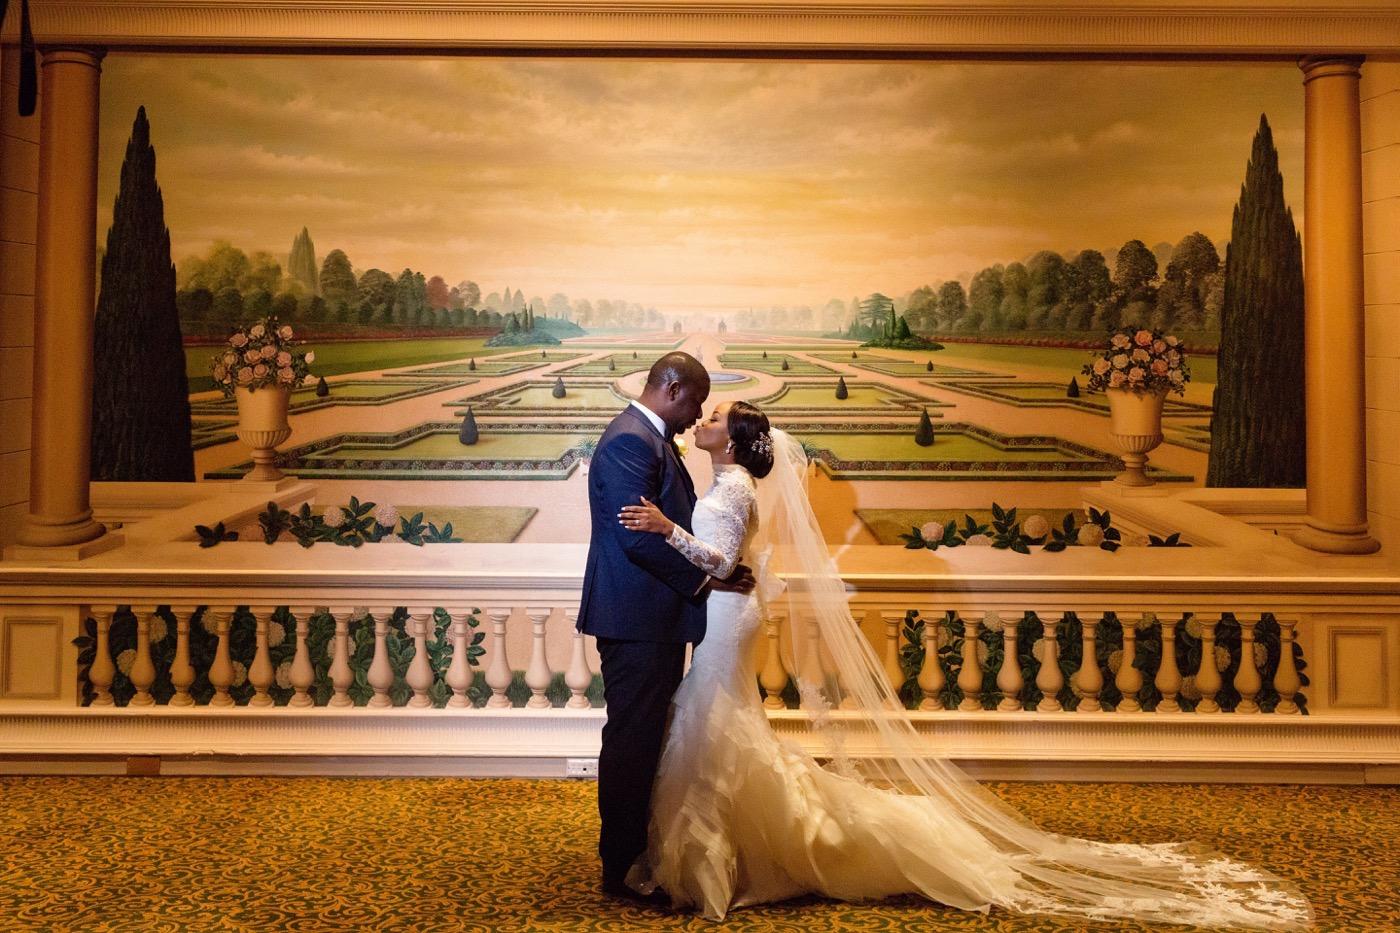 Tayo and Kike's Aisle Perfect Wedding at the Historic Grosvenor house 54